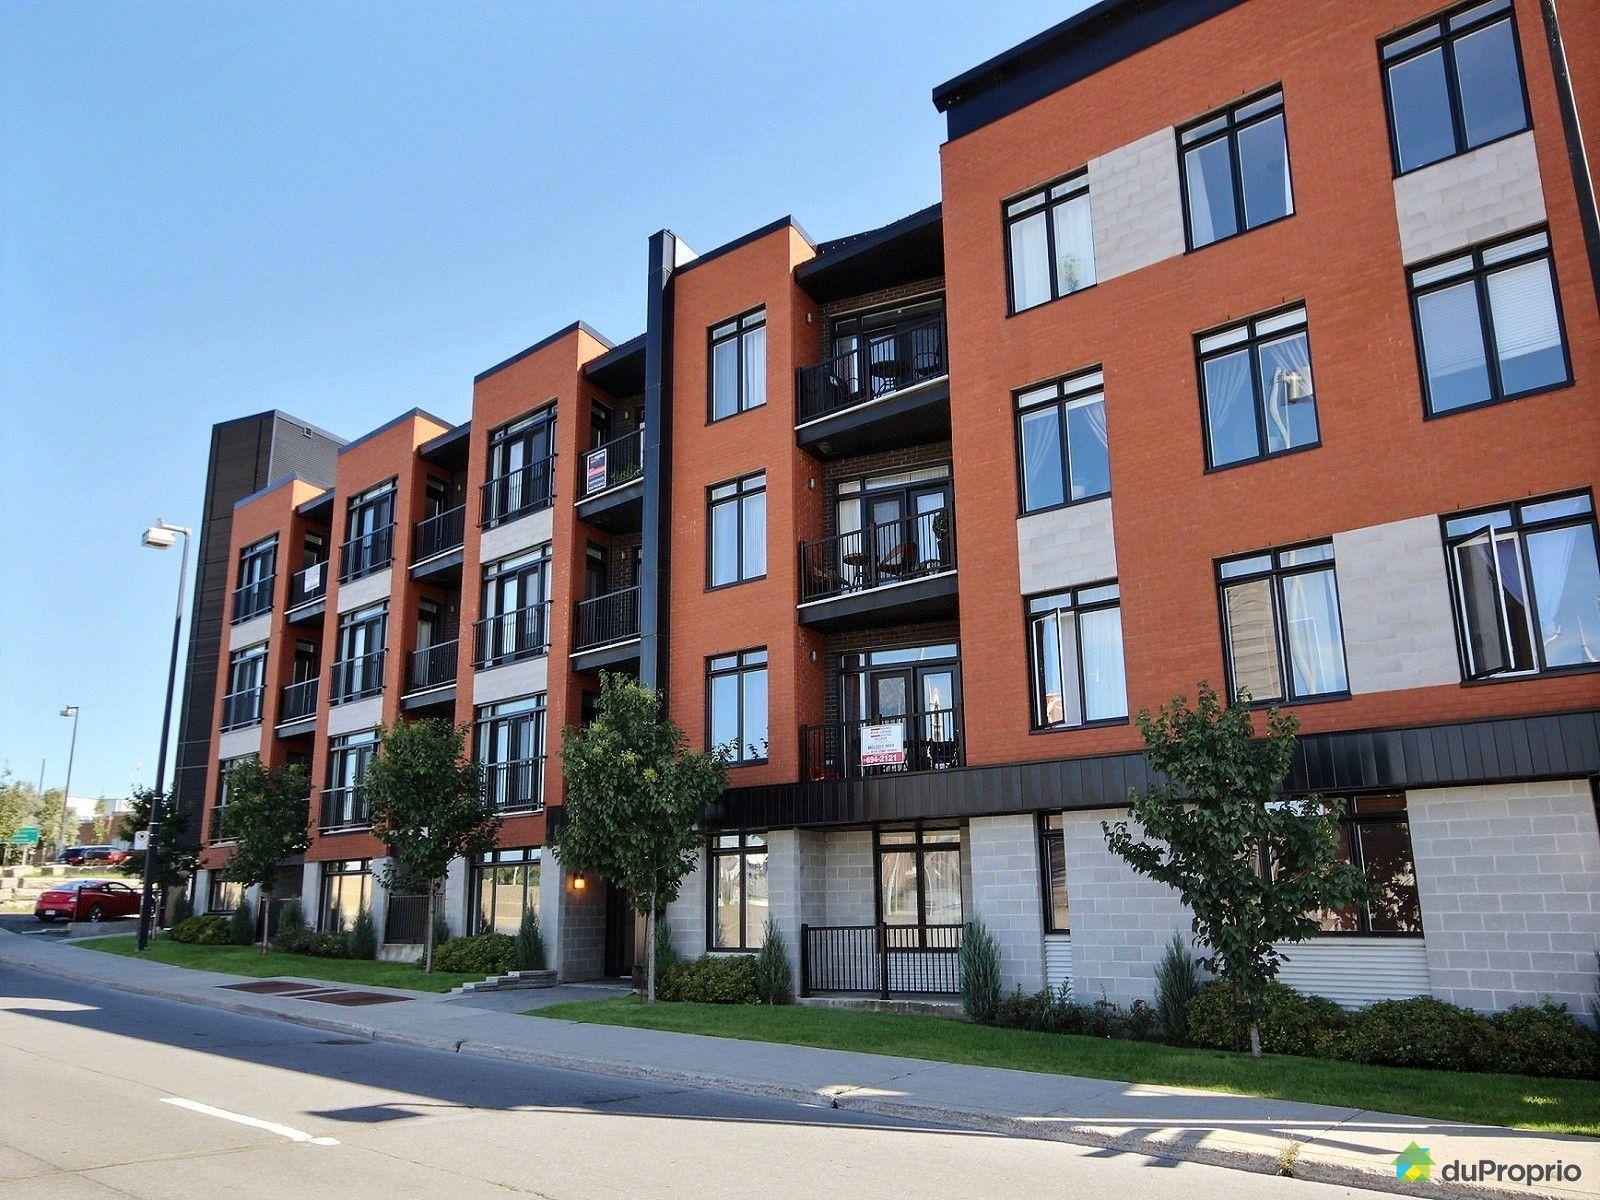 Condo vendu montr al immobilier qu bec duproprio 361752 for Piscine exterieur montreal